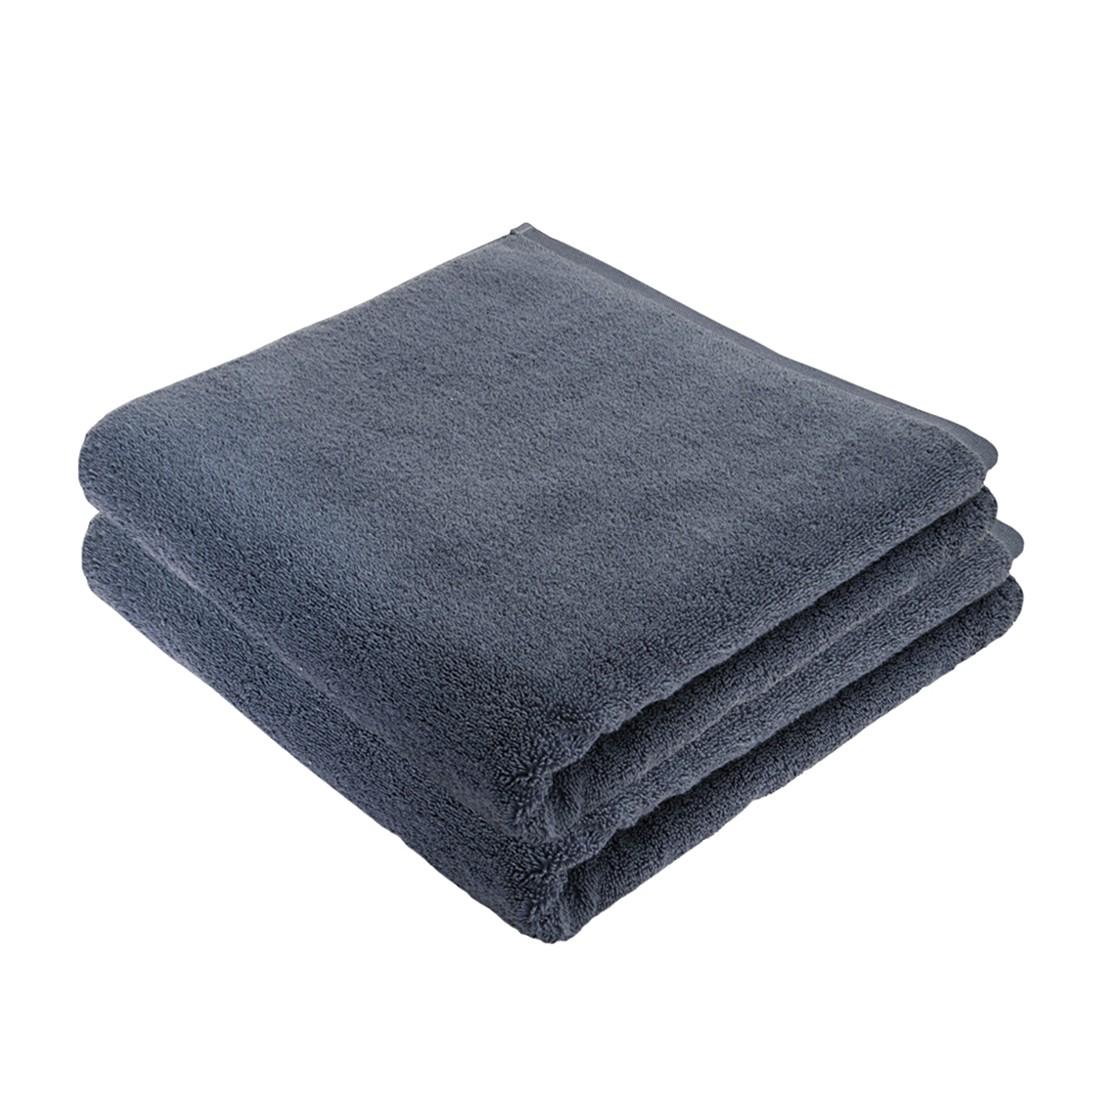 Duschtuch PURE (2er-Set) – 100% Baumwolle – Blaugrau, stilana jetzt bestellen